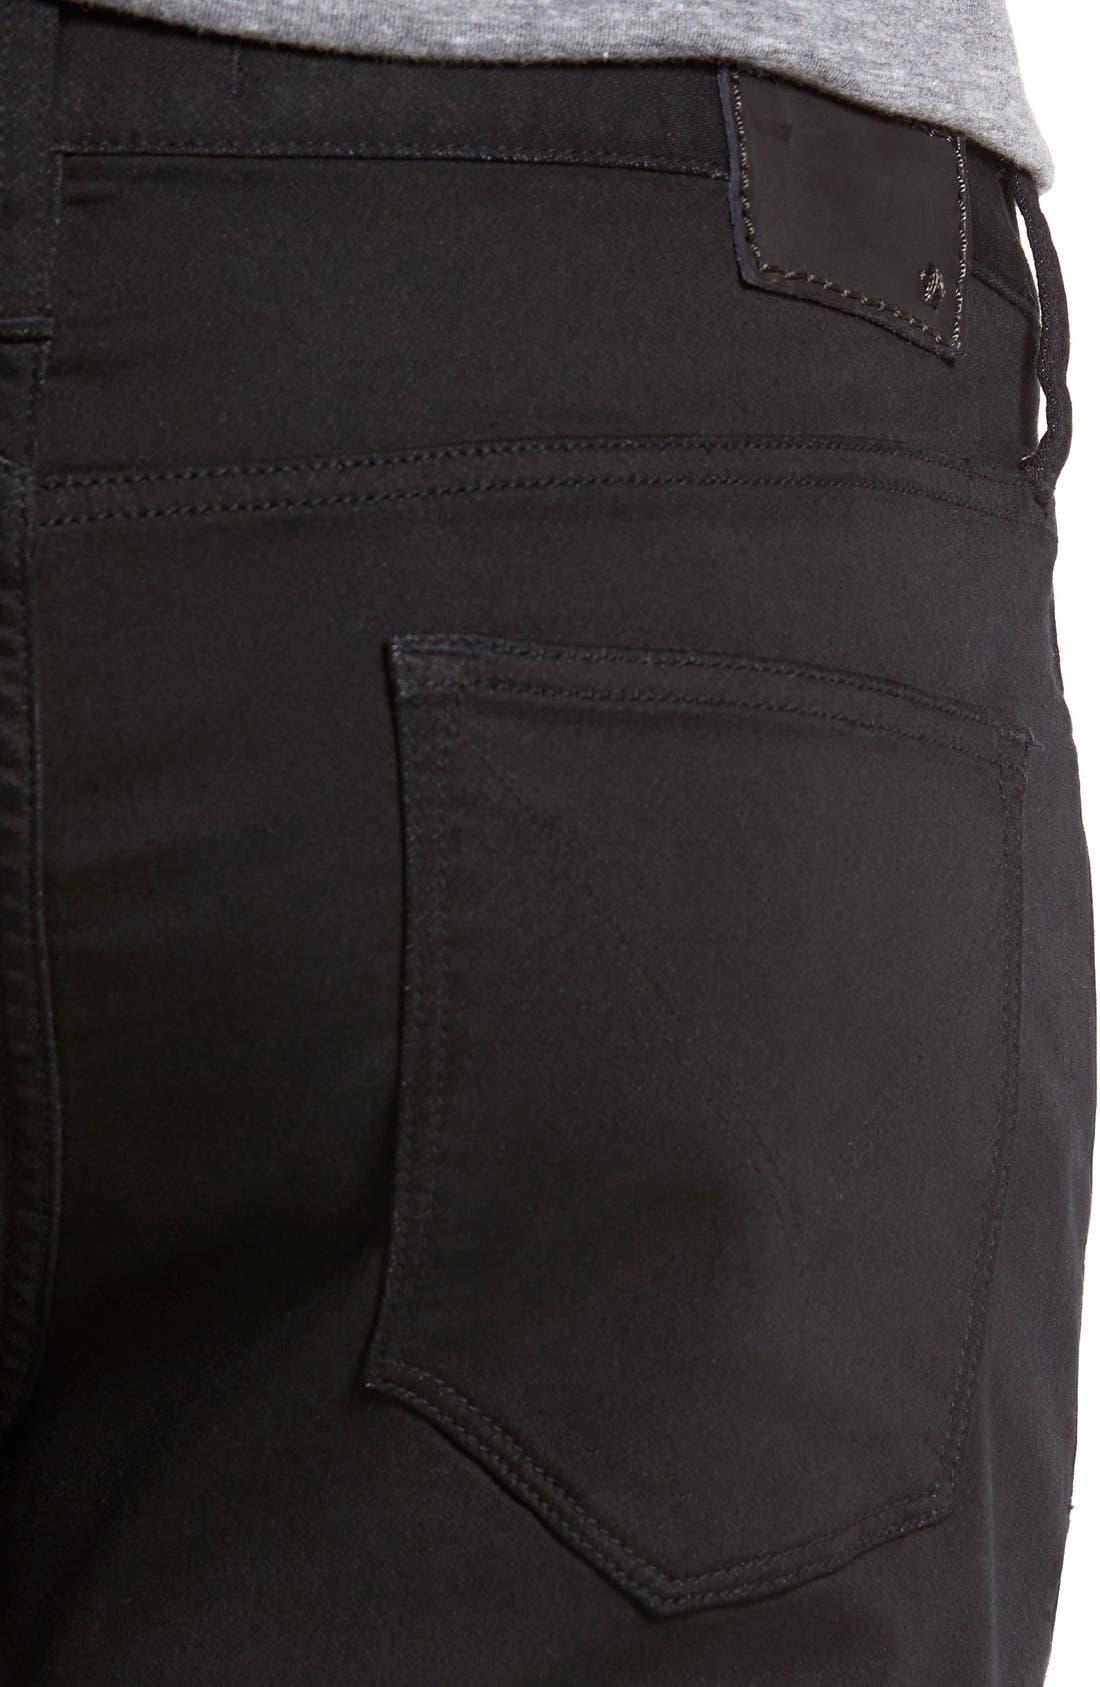 'Bowery' Slim Straight Leg Jeans,                             Alternate thumbnail 4, color,                             Black